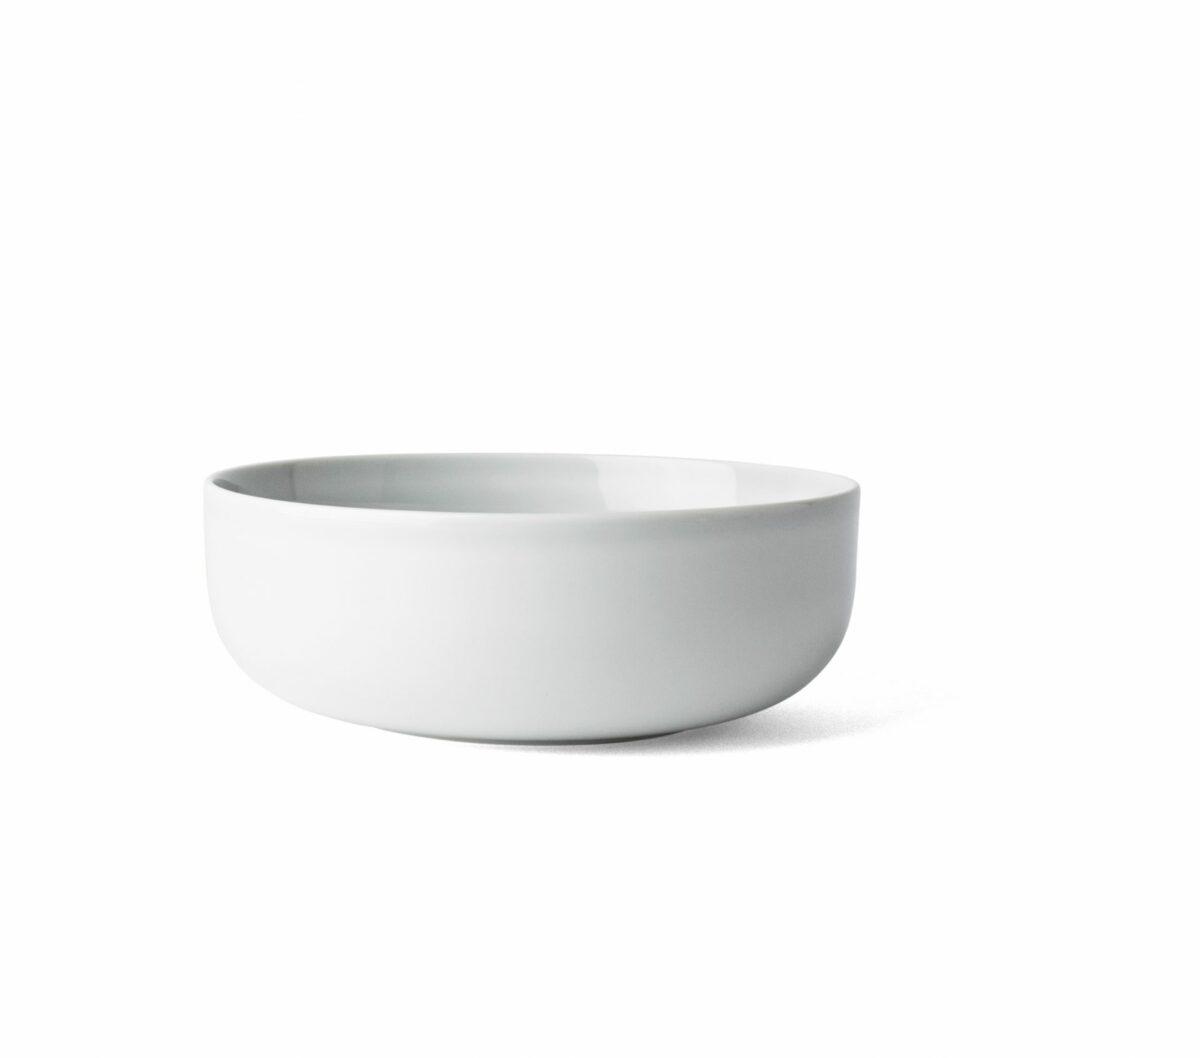 2017940 New Norm Bowl O175 cm Smoke Norm 01